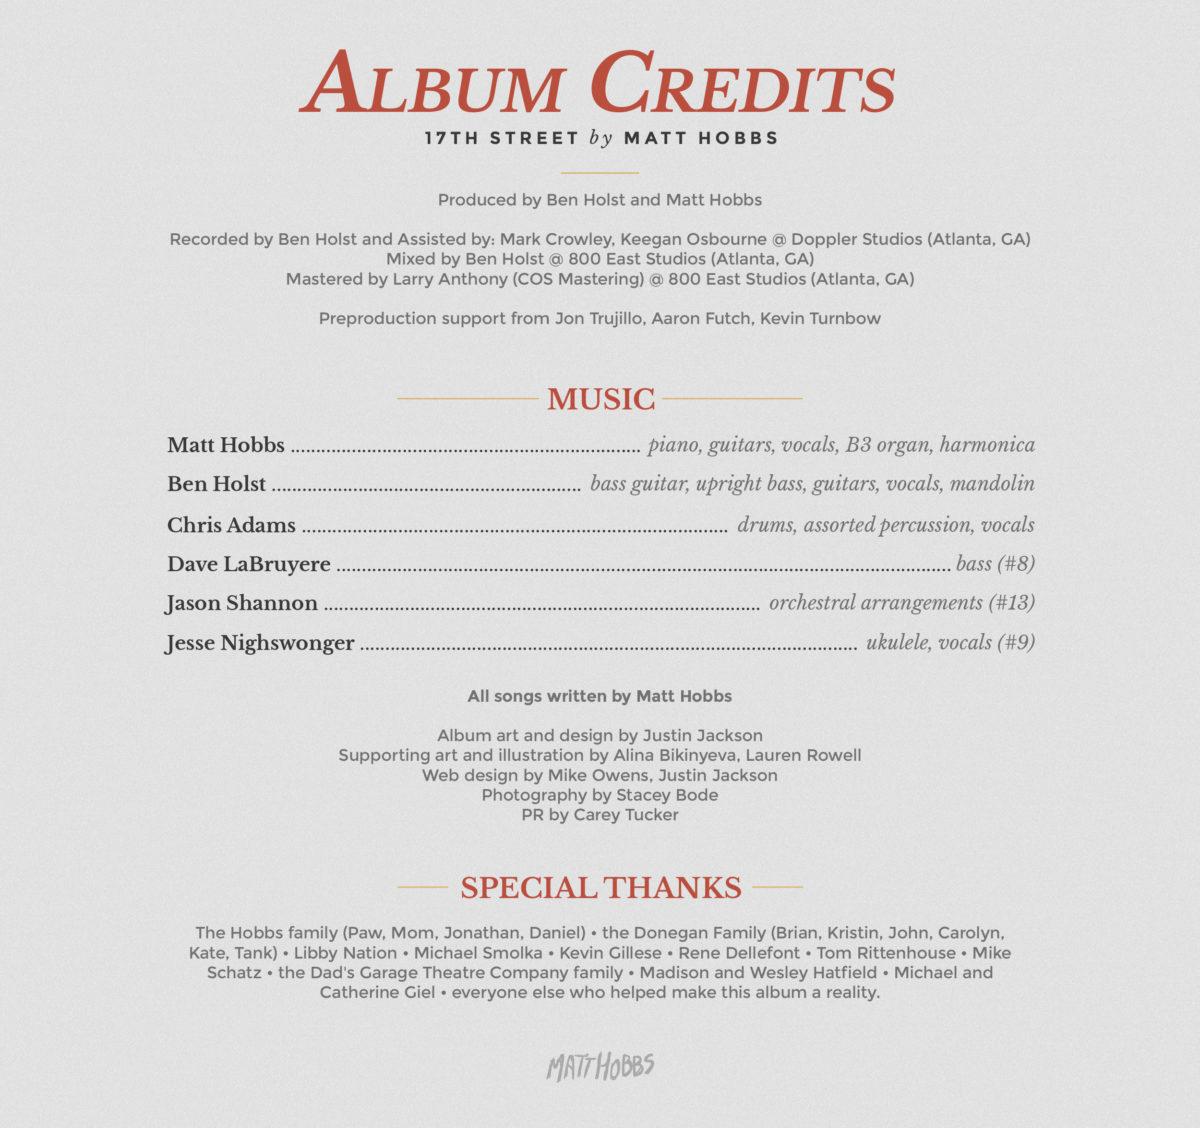 MH_AlbumCredits_PROOFc-1200x1128.jpg